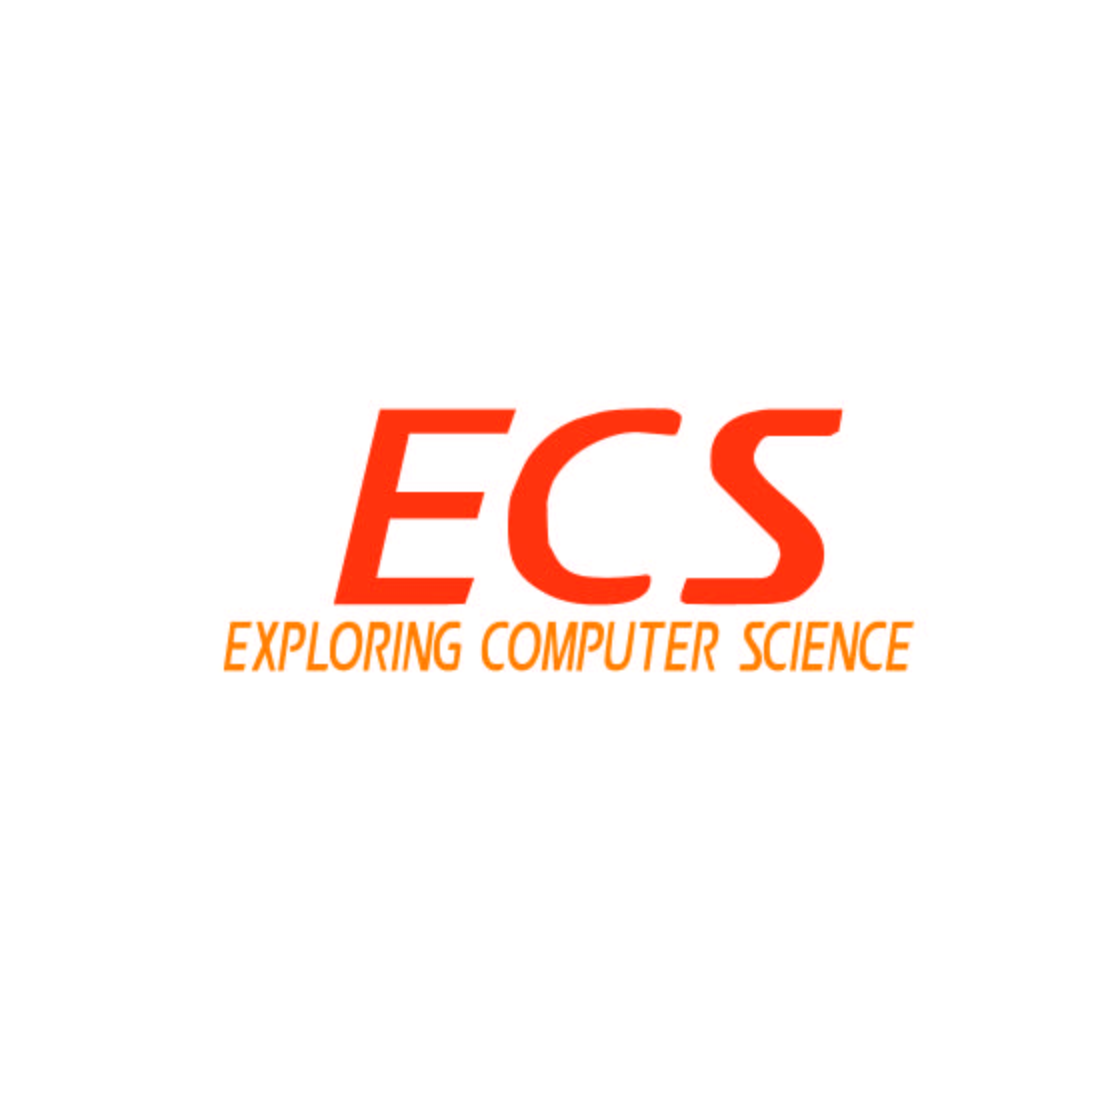 Logo Design by Saunter - Entry No. 85 in the Logo Design Contest ECS - Exploring Computer Science.